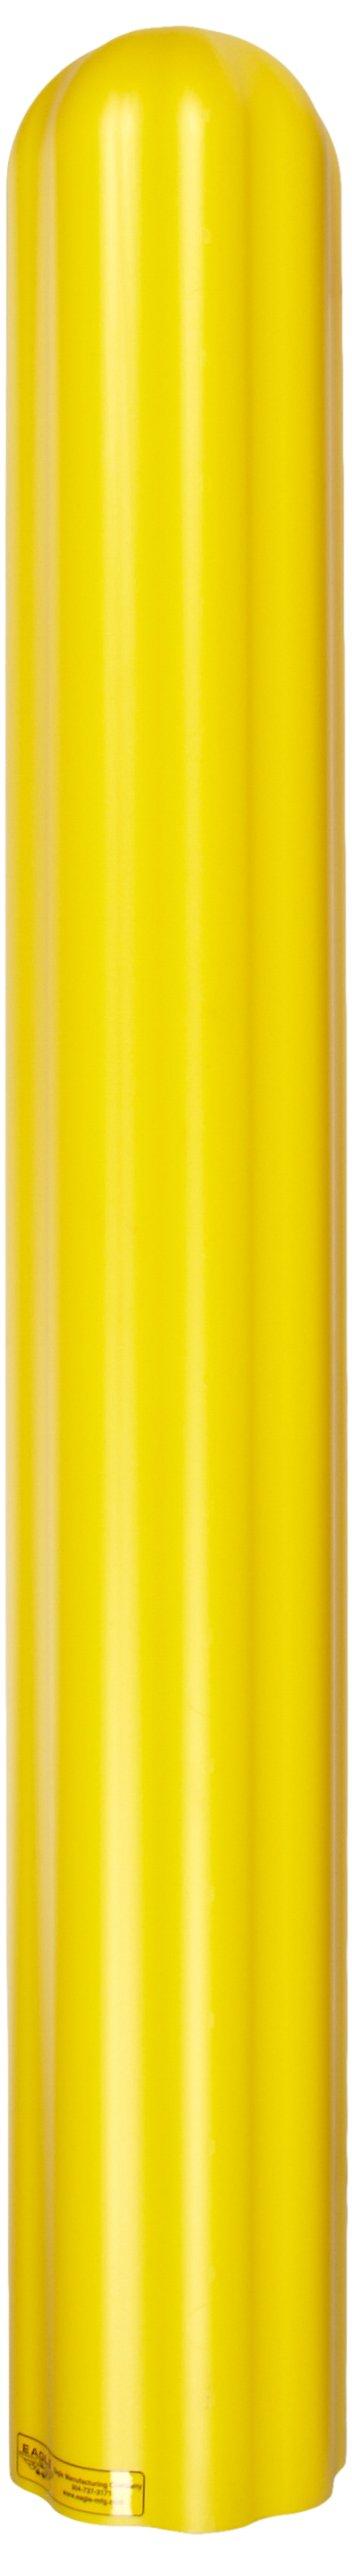 Eagle 1730 HDPE 6'' Bumper/Bollard Post Sleeve, Yellow, 7.875'' OD, 56'' Height